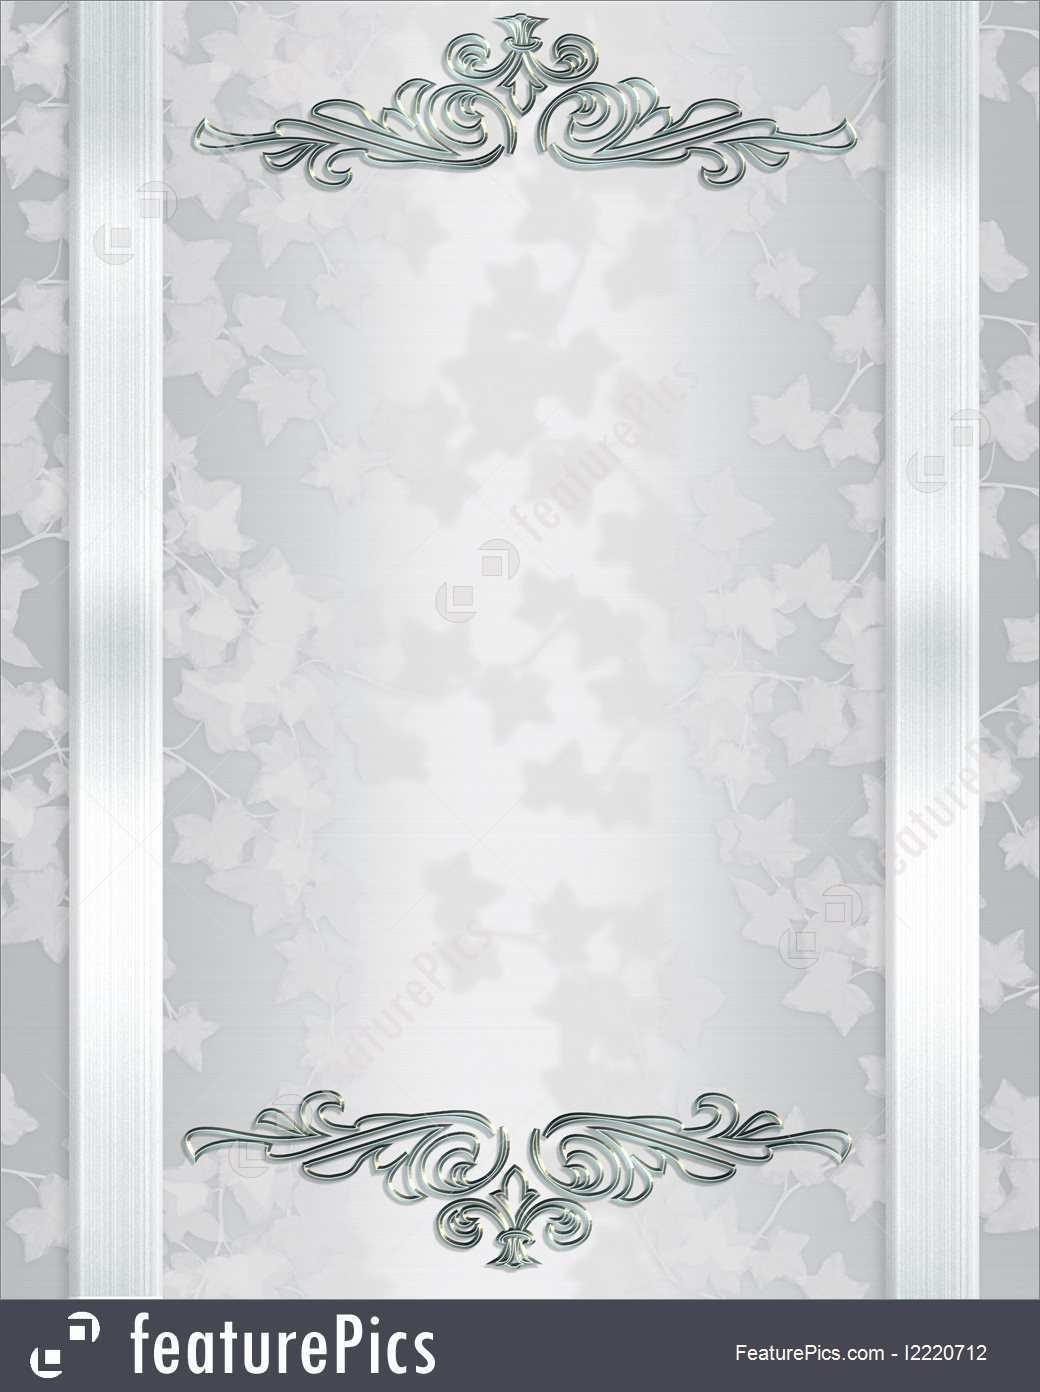 48 Blank Elegant Invitation Background Designs Layouts for Elegant Invitation Background Designs